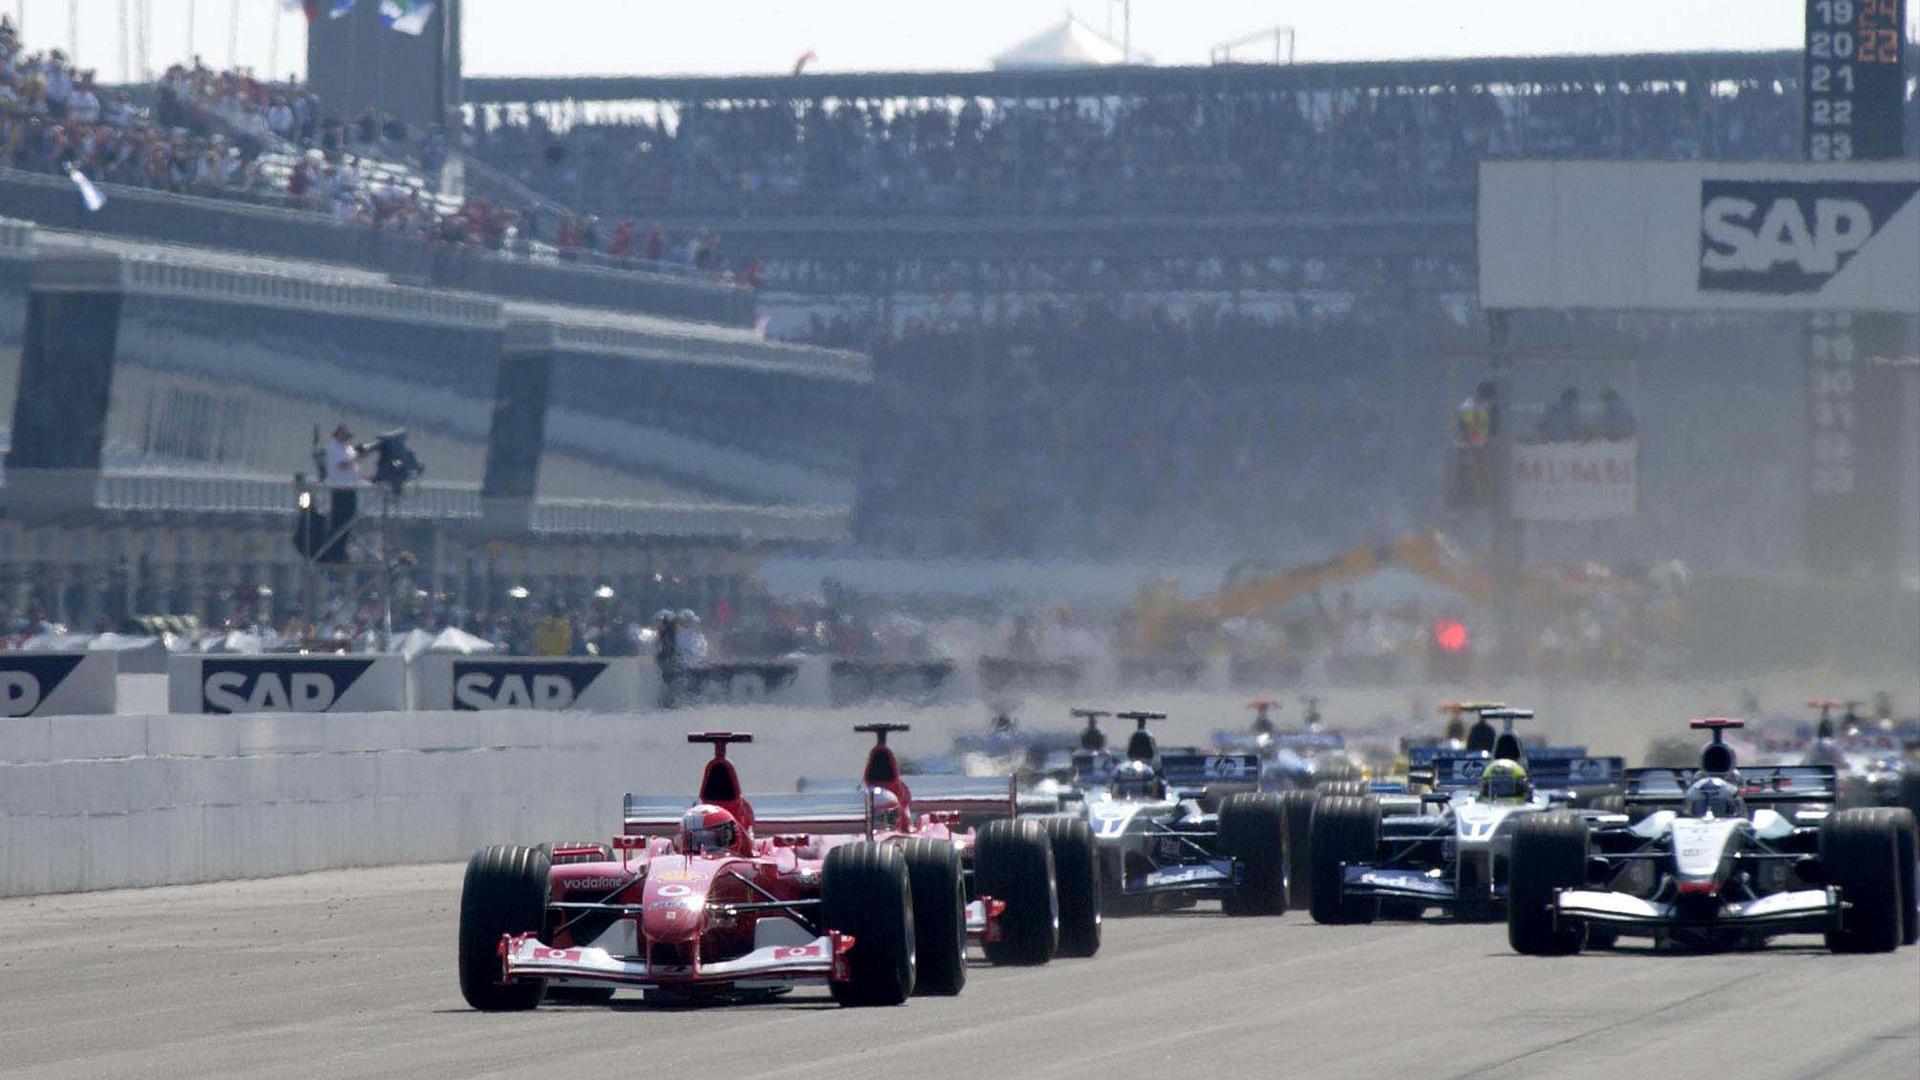 Hd Wallpapers 2002 Formula 1 Grand Prix Of Usa F1